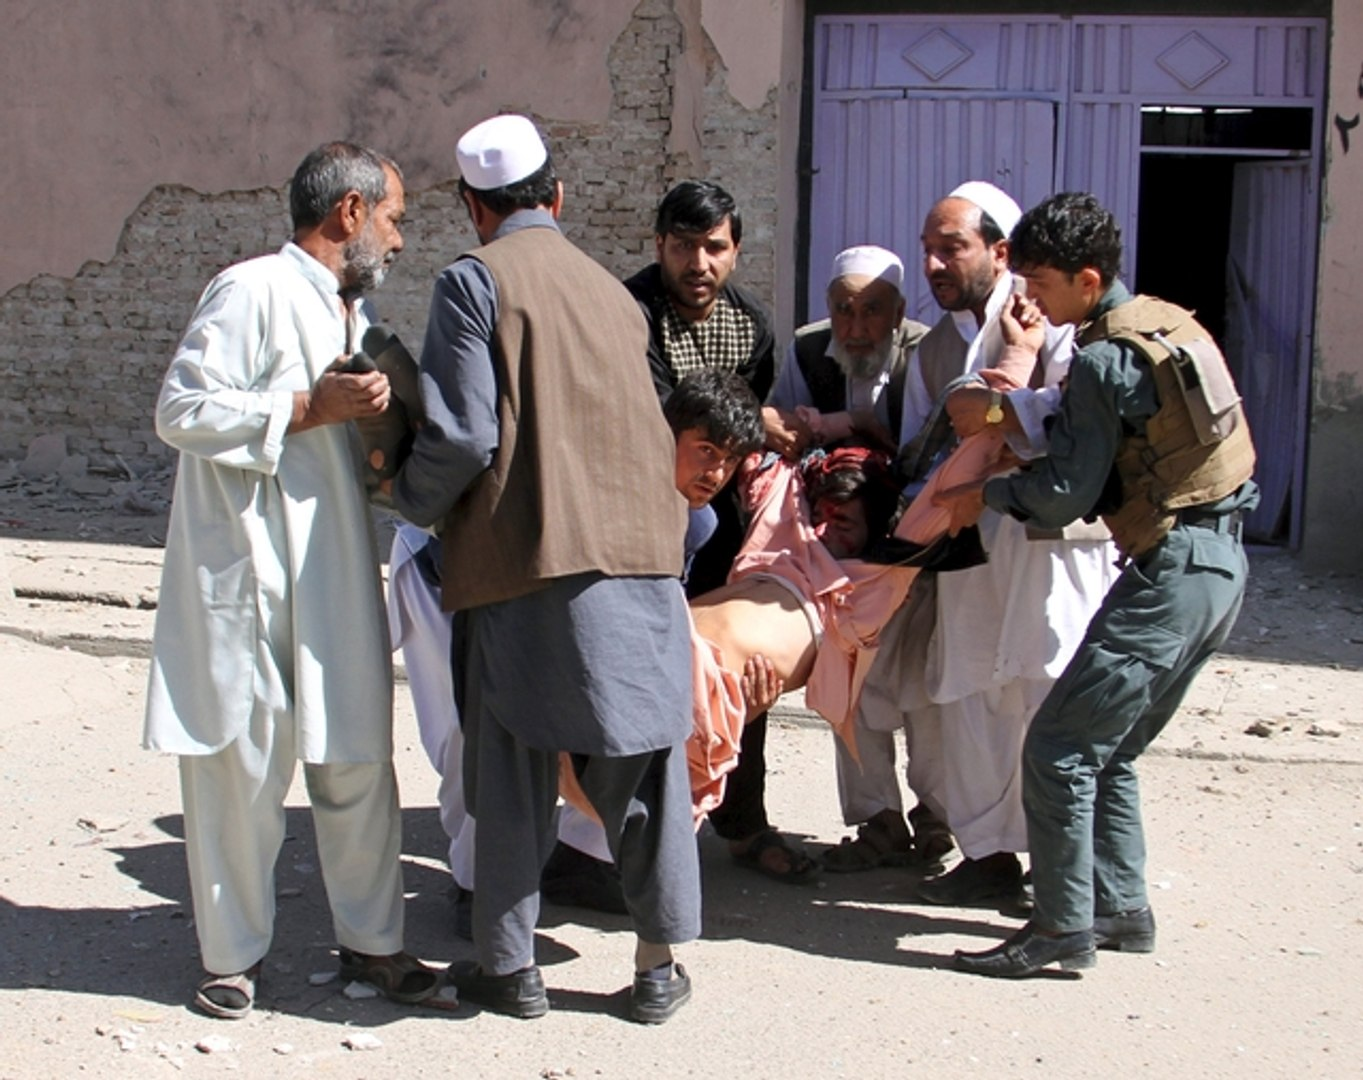 U.S. investigating air strike near Afghan hospital that killed 19